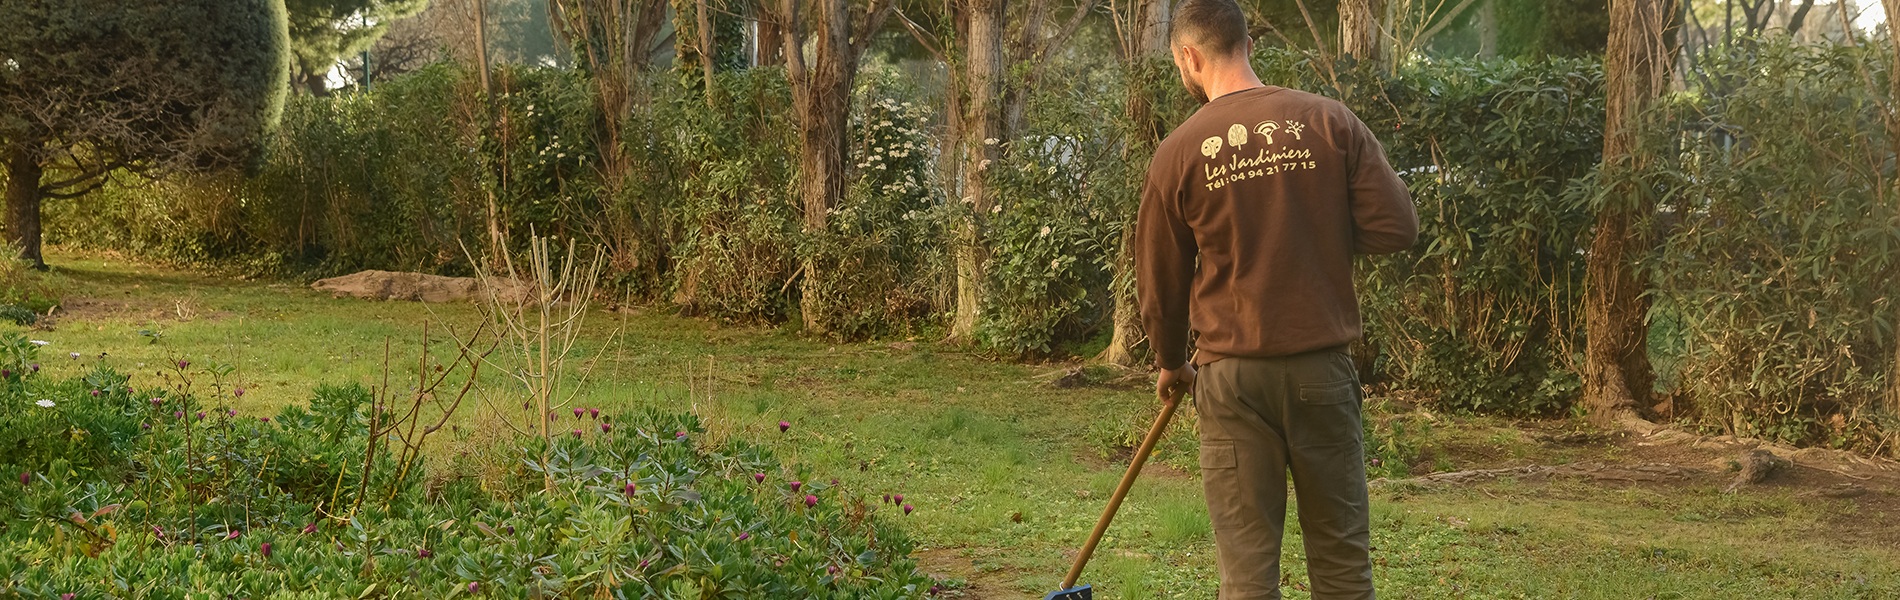 creation-entretien-jardin-jardinier-paysagiste